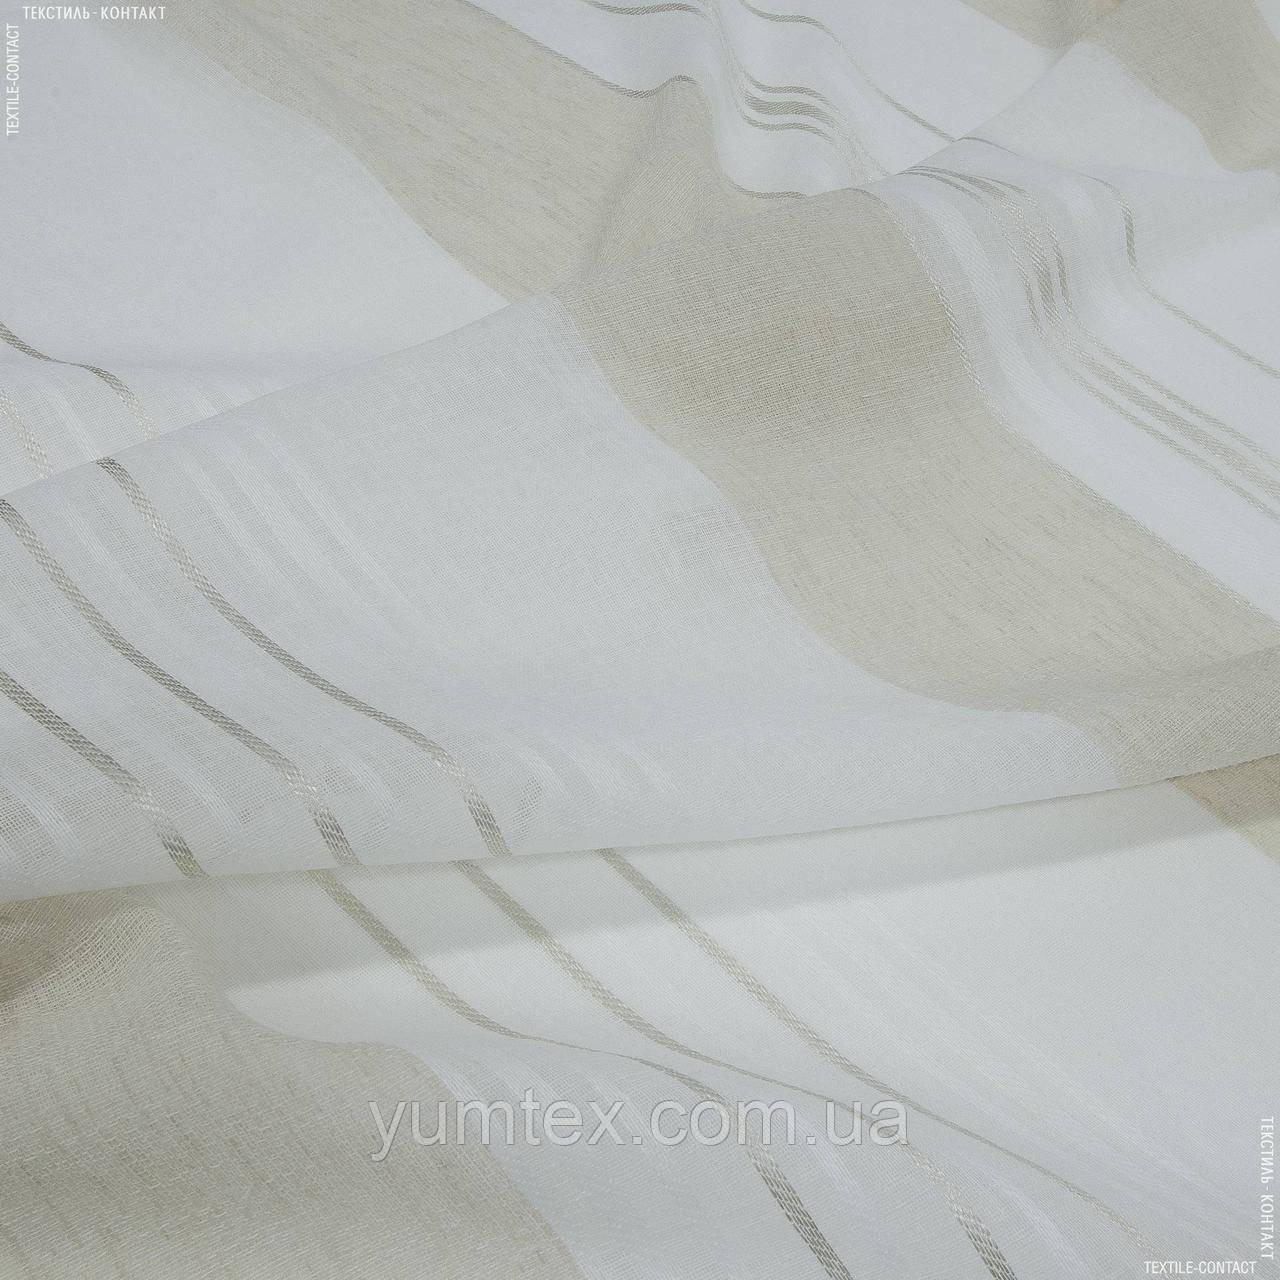 Тюль з обважнювачем серпанок роял/ royal / купон 136450